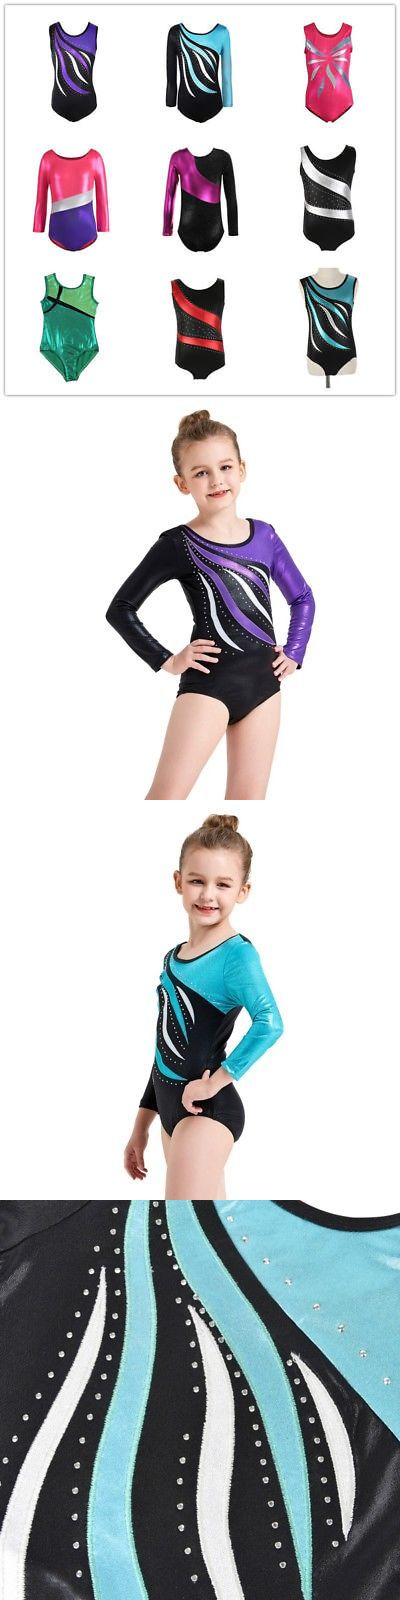 f36f6657f Dancewear 112425  Us Kids Girl Ballet Dancewear Gymnastics Leotard ...